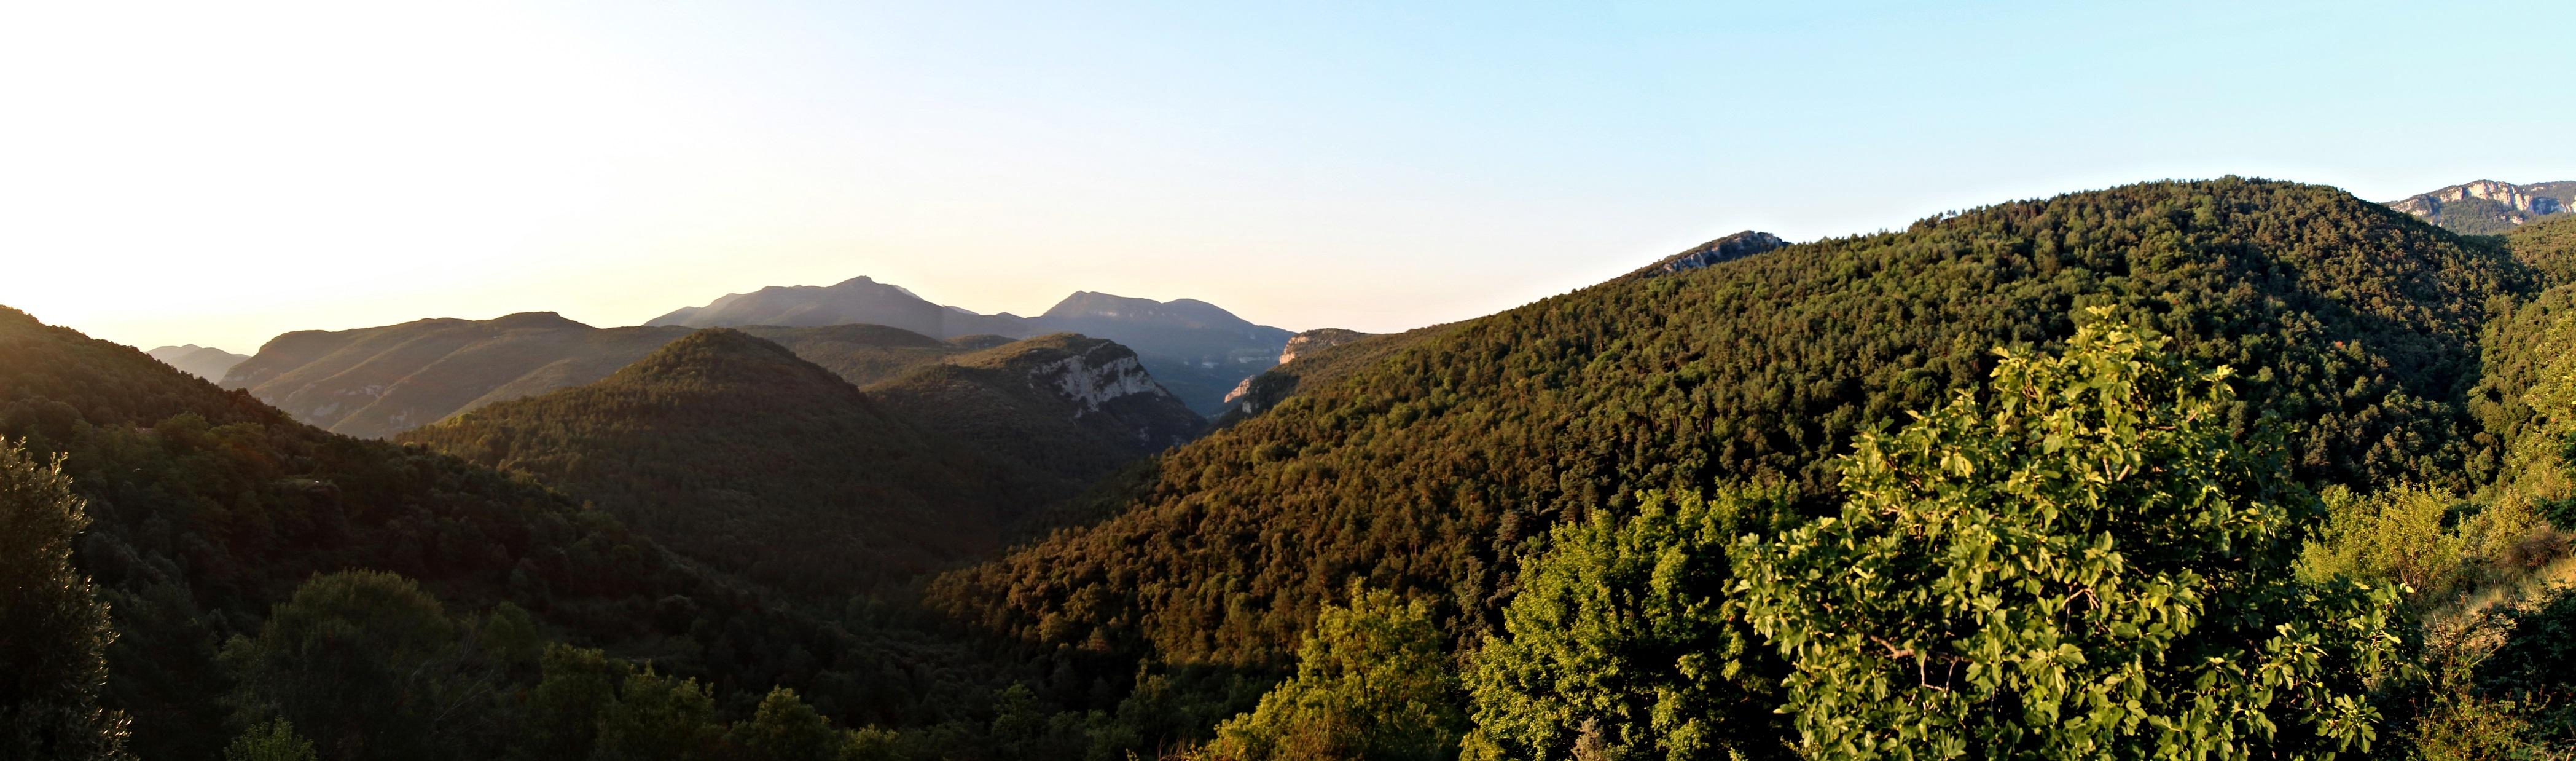 IMG_3766_panorama.jpg